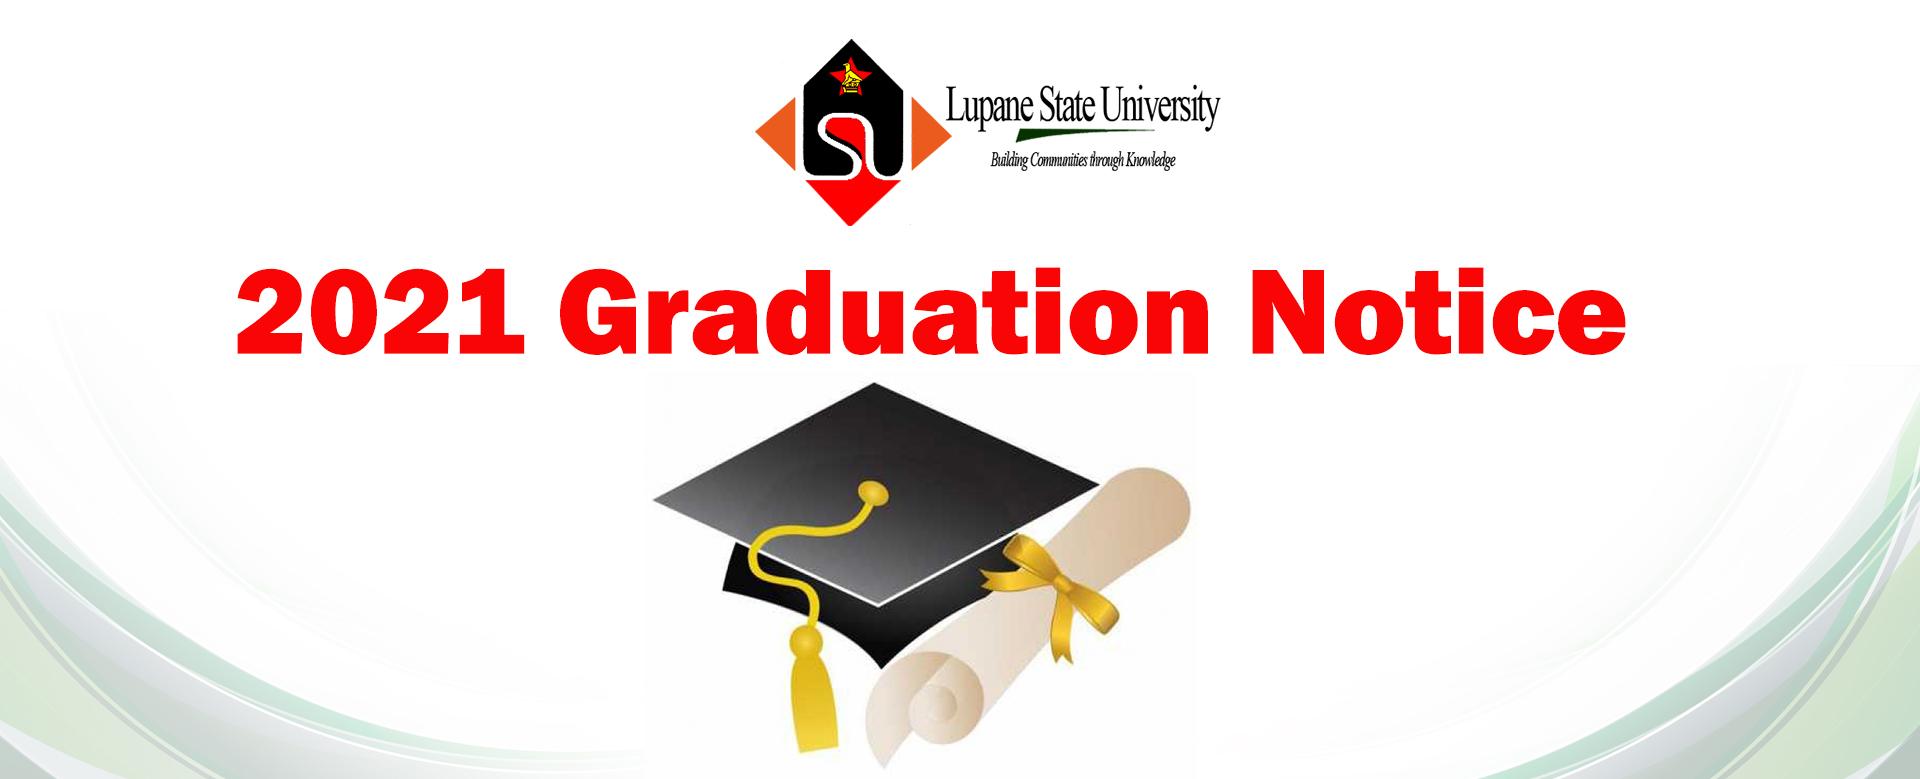 2021 Graduation Notice